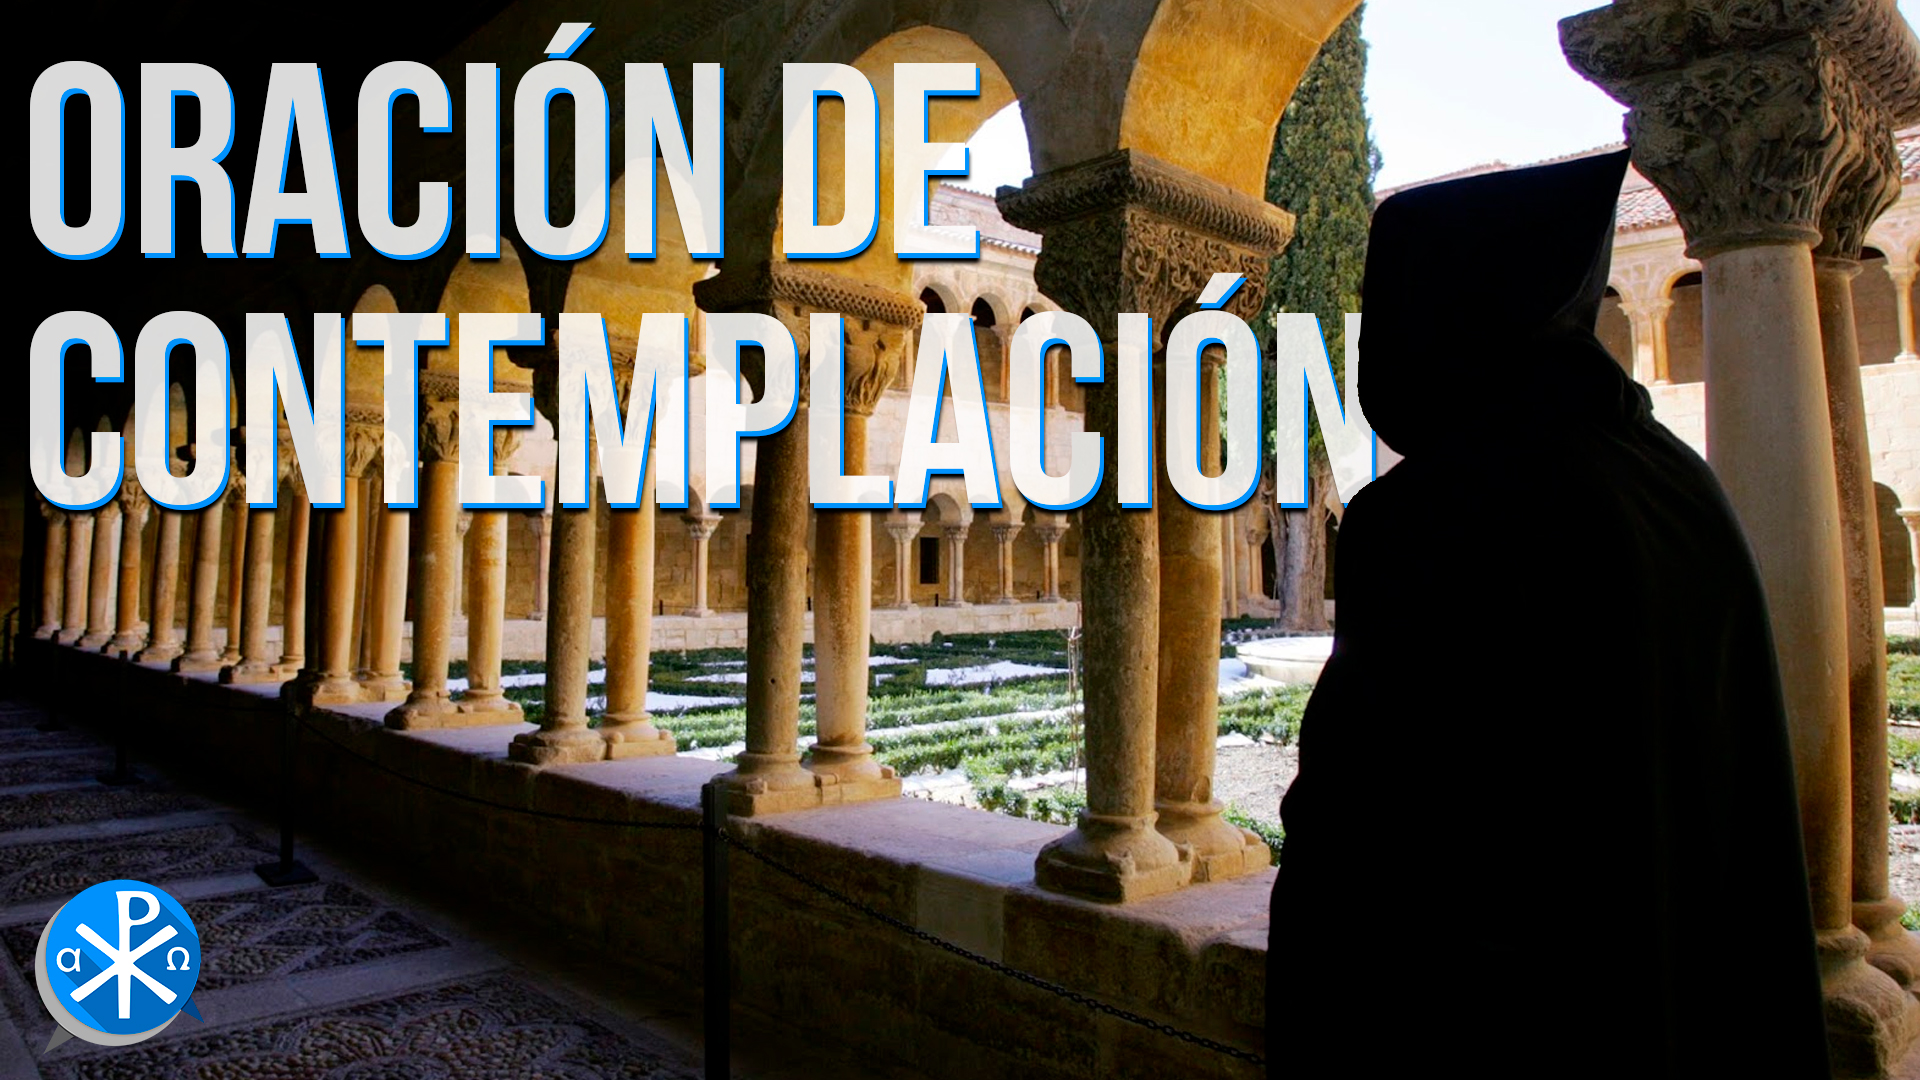 Oración de Contemplación